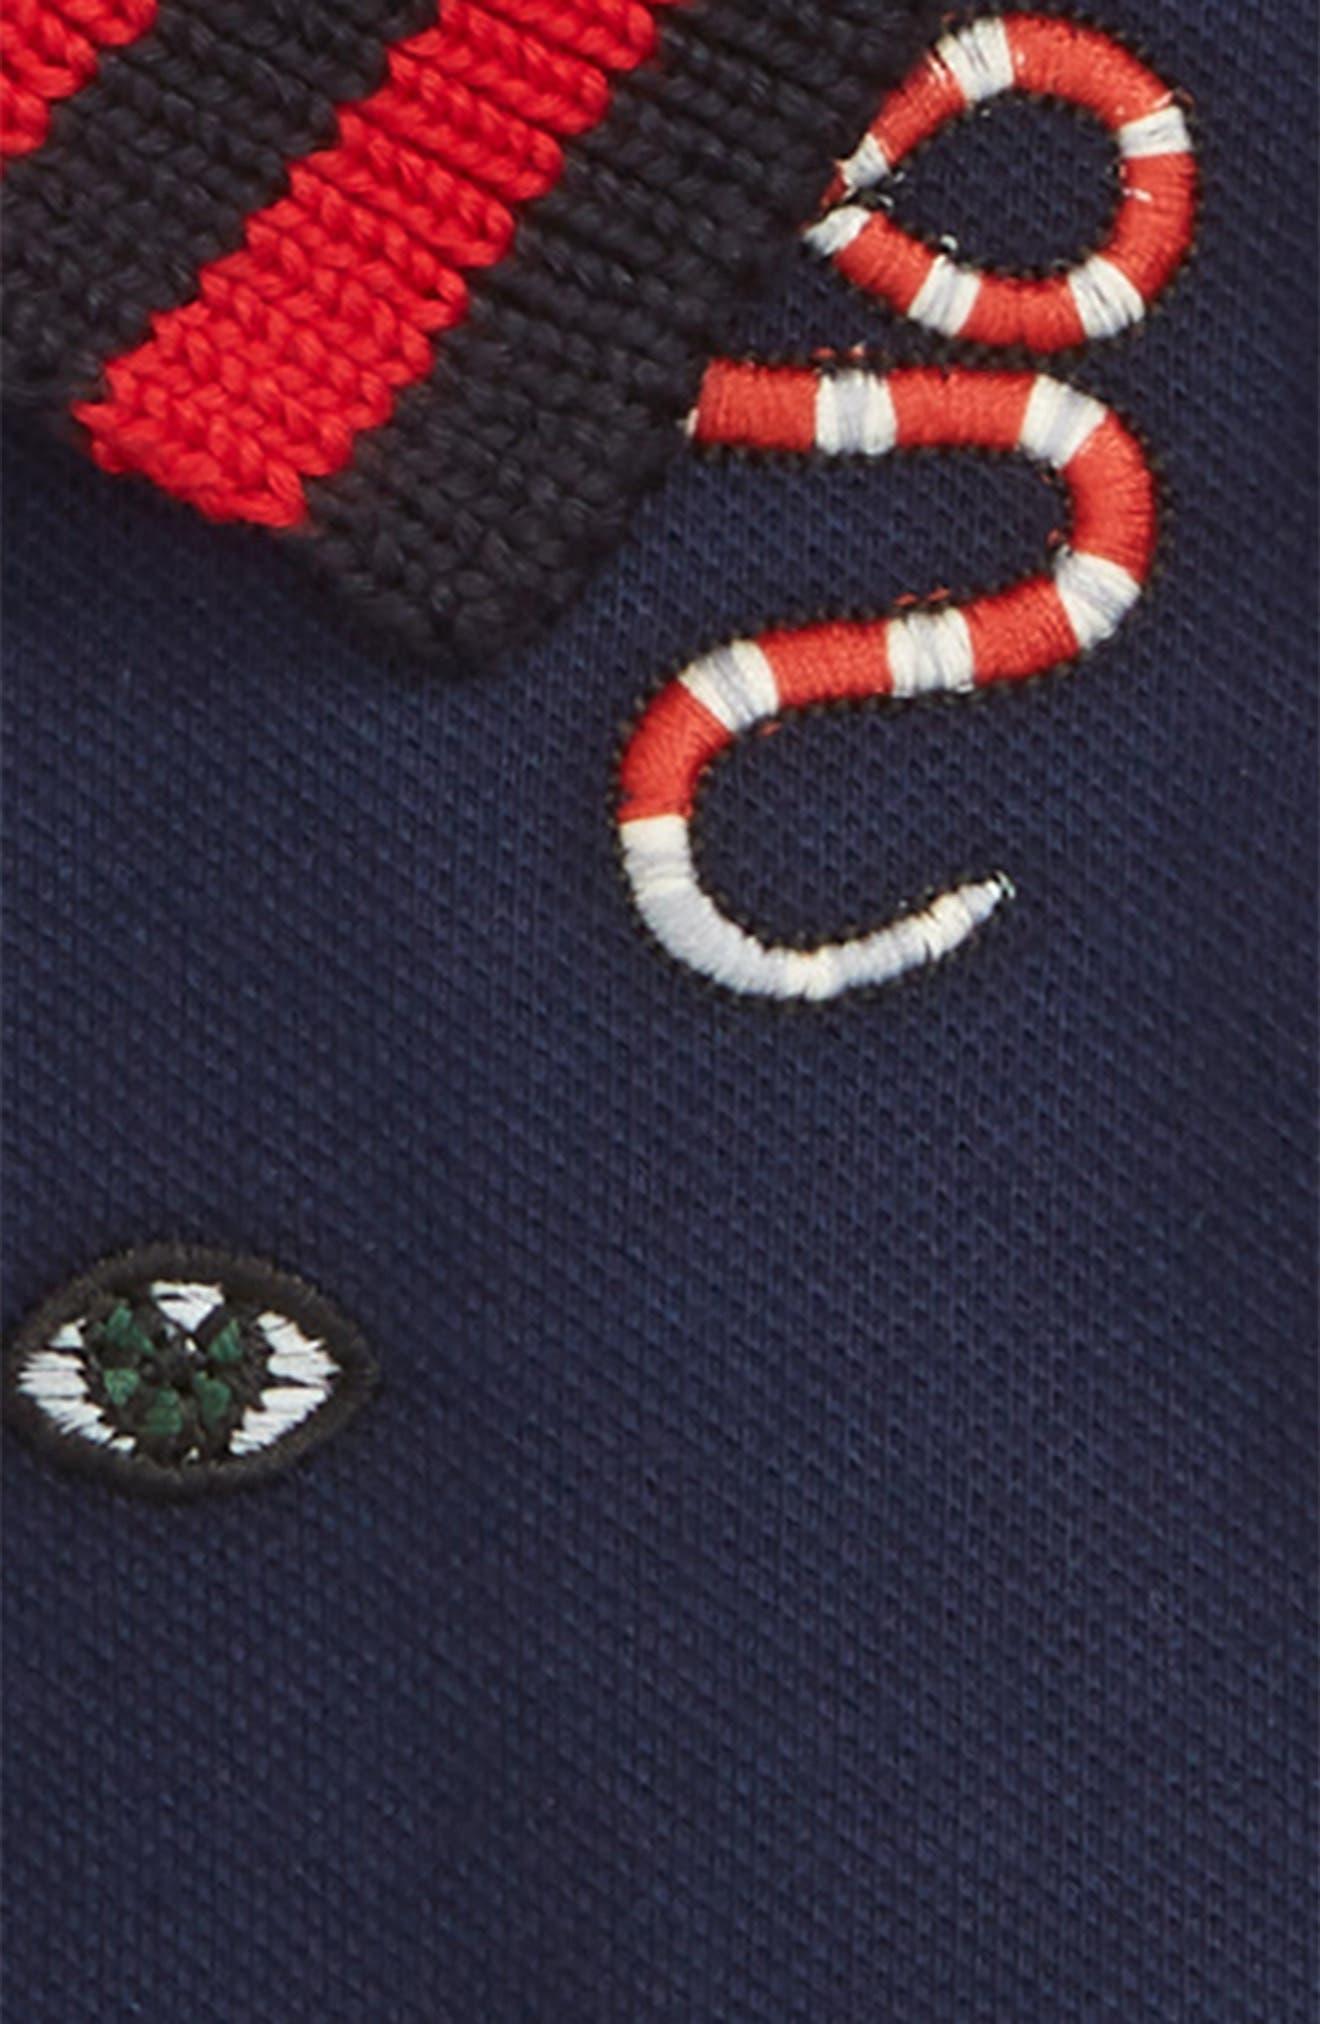 Embroidered Cotton Piqué Polo,                             Alternate thumbnail 2, color,                             OLTREMARE/ MULTICO